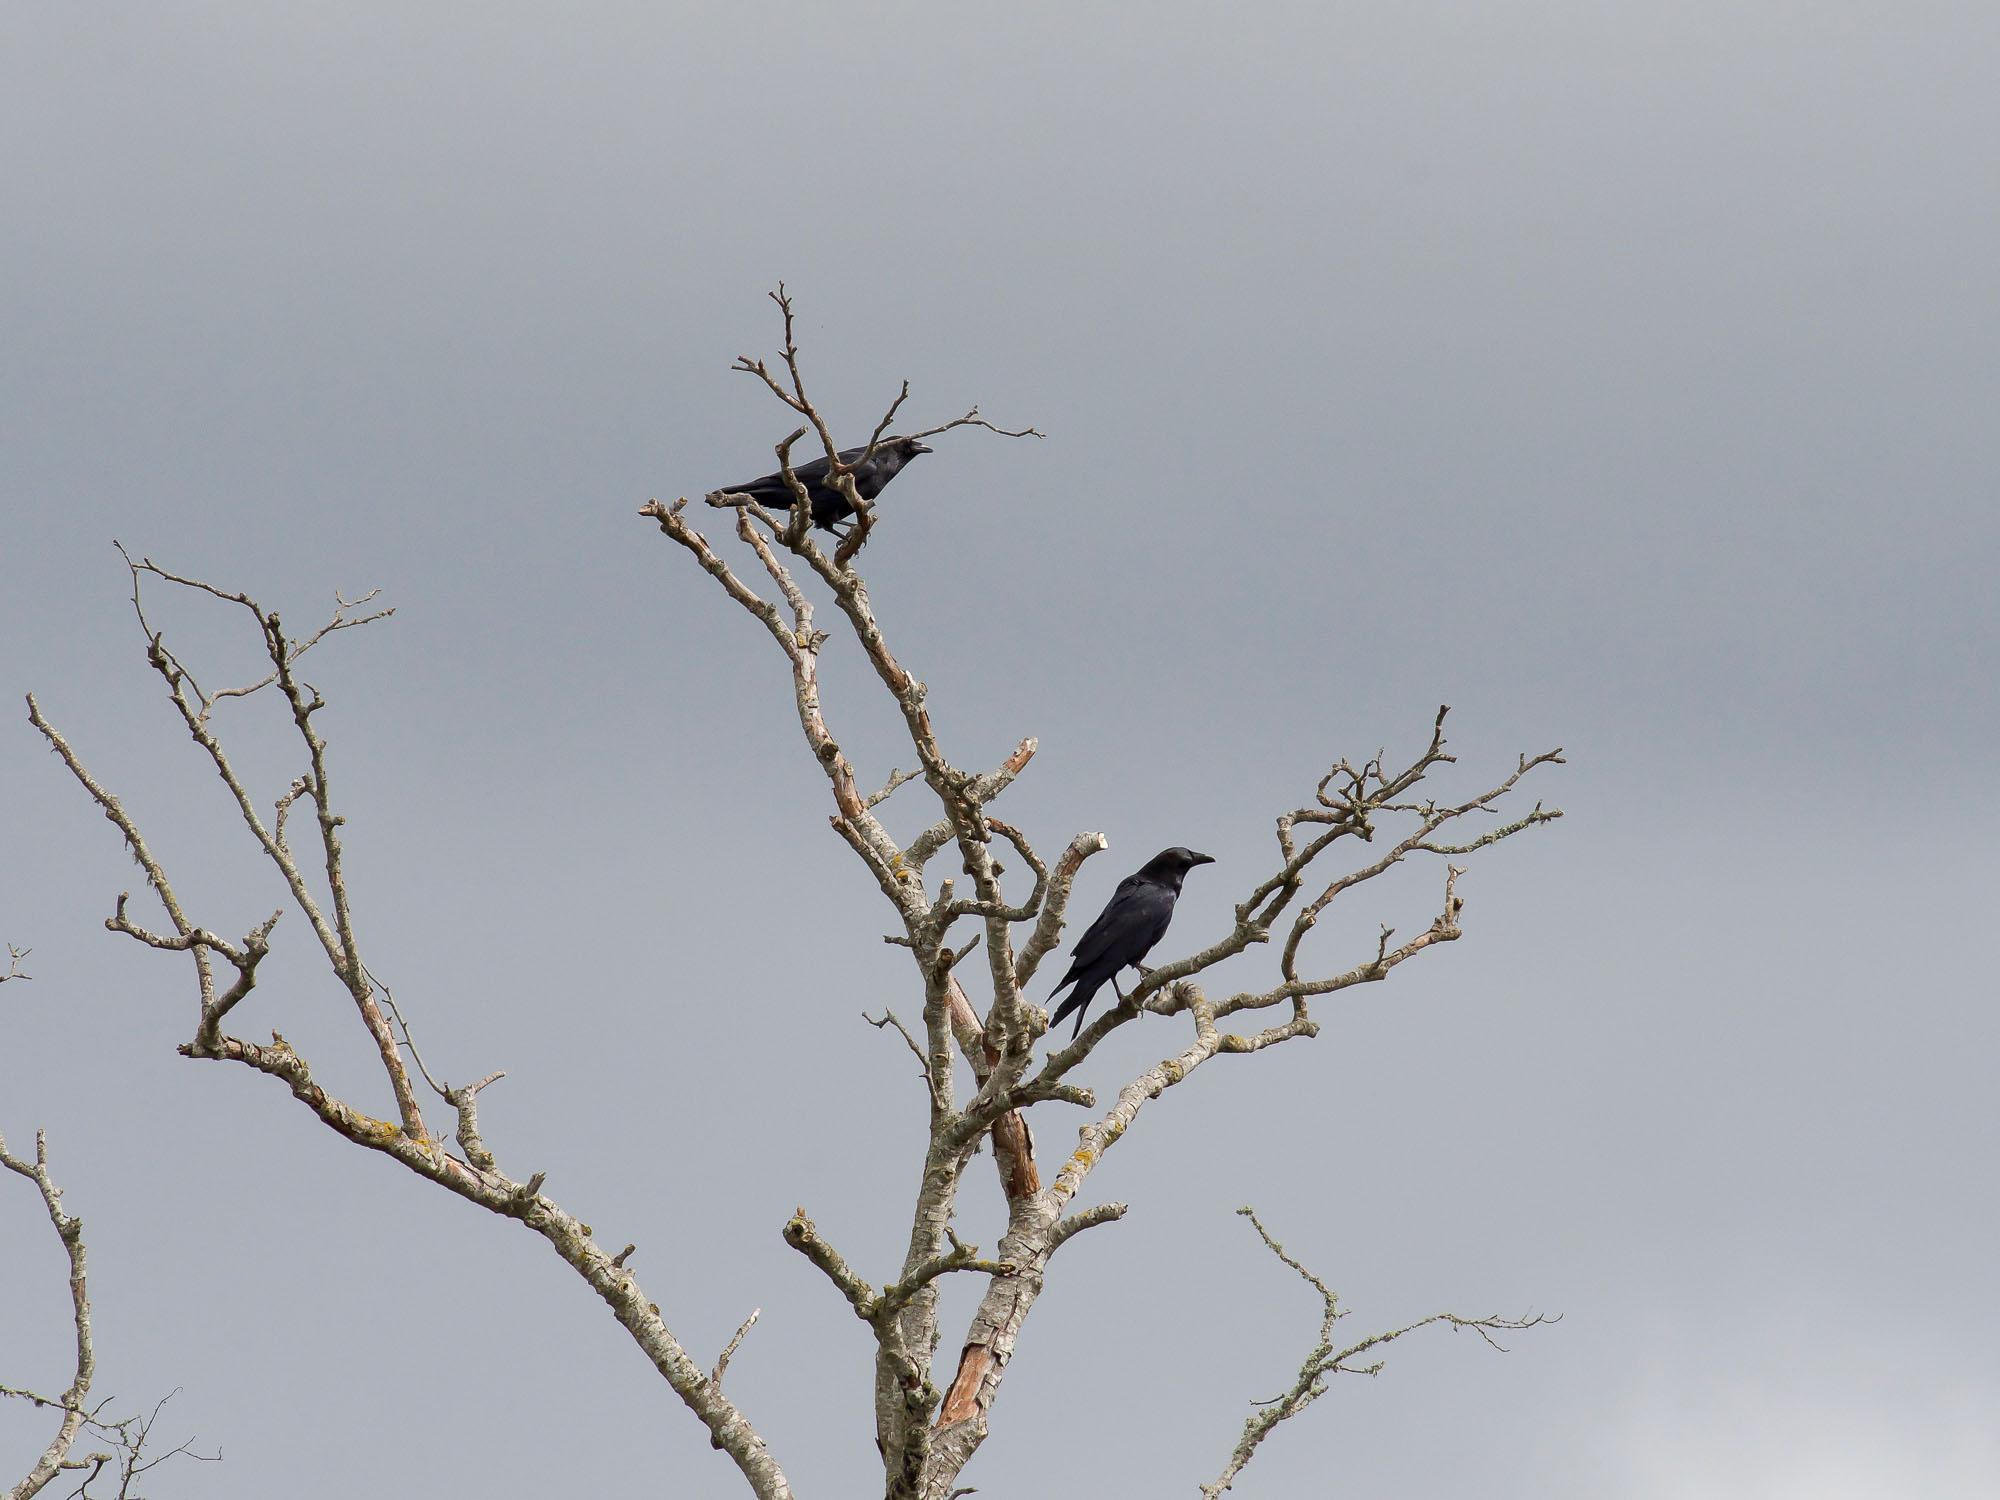 crows-bothering-owls-4.jpg